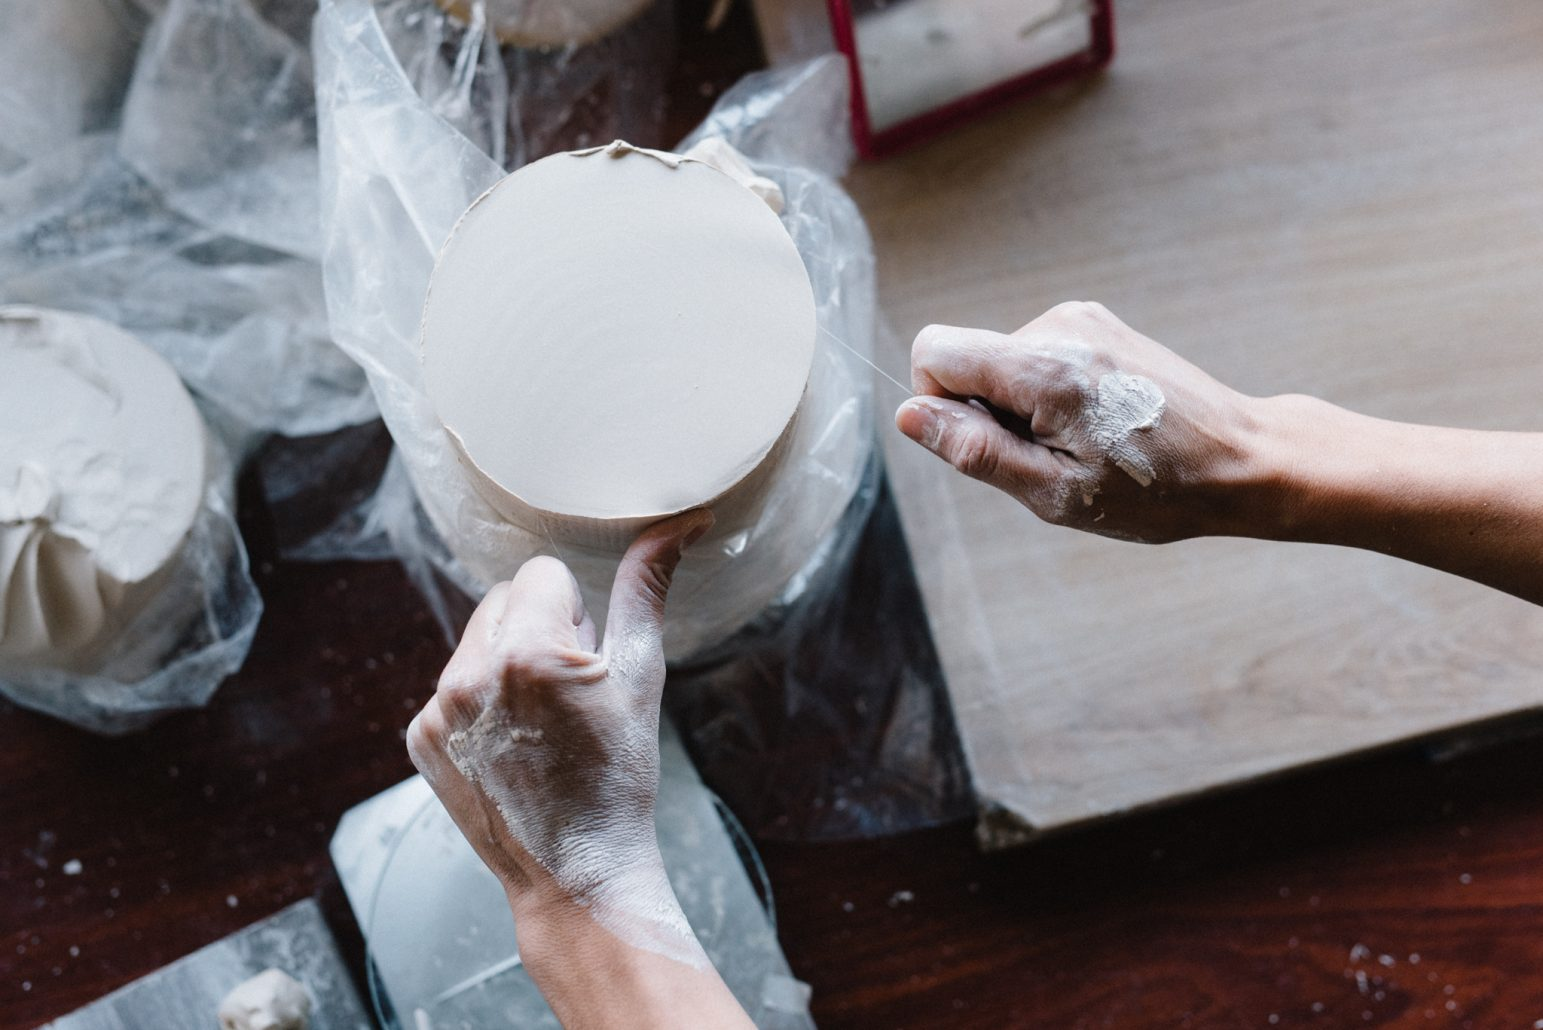 16-WEB-ceramiste-hortense-montarnal_caracterequotidien_17decembre2015_ChloeLapeyssonnie-5253